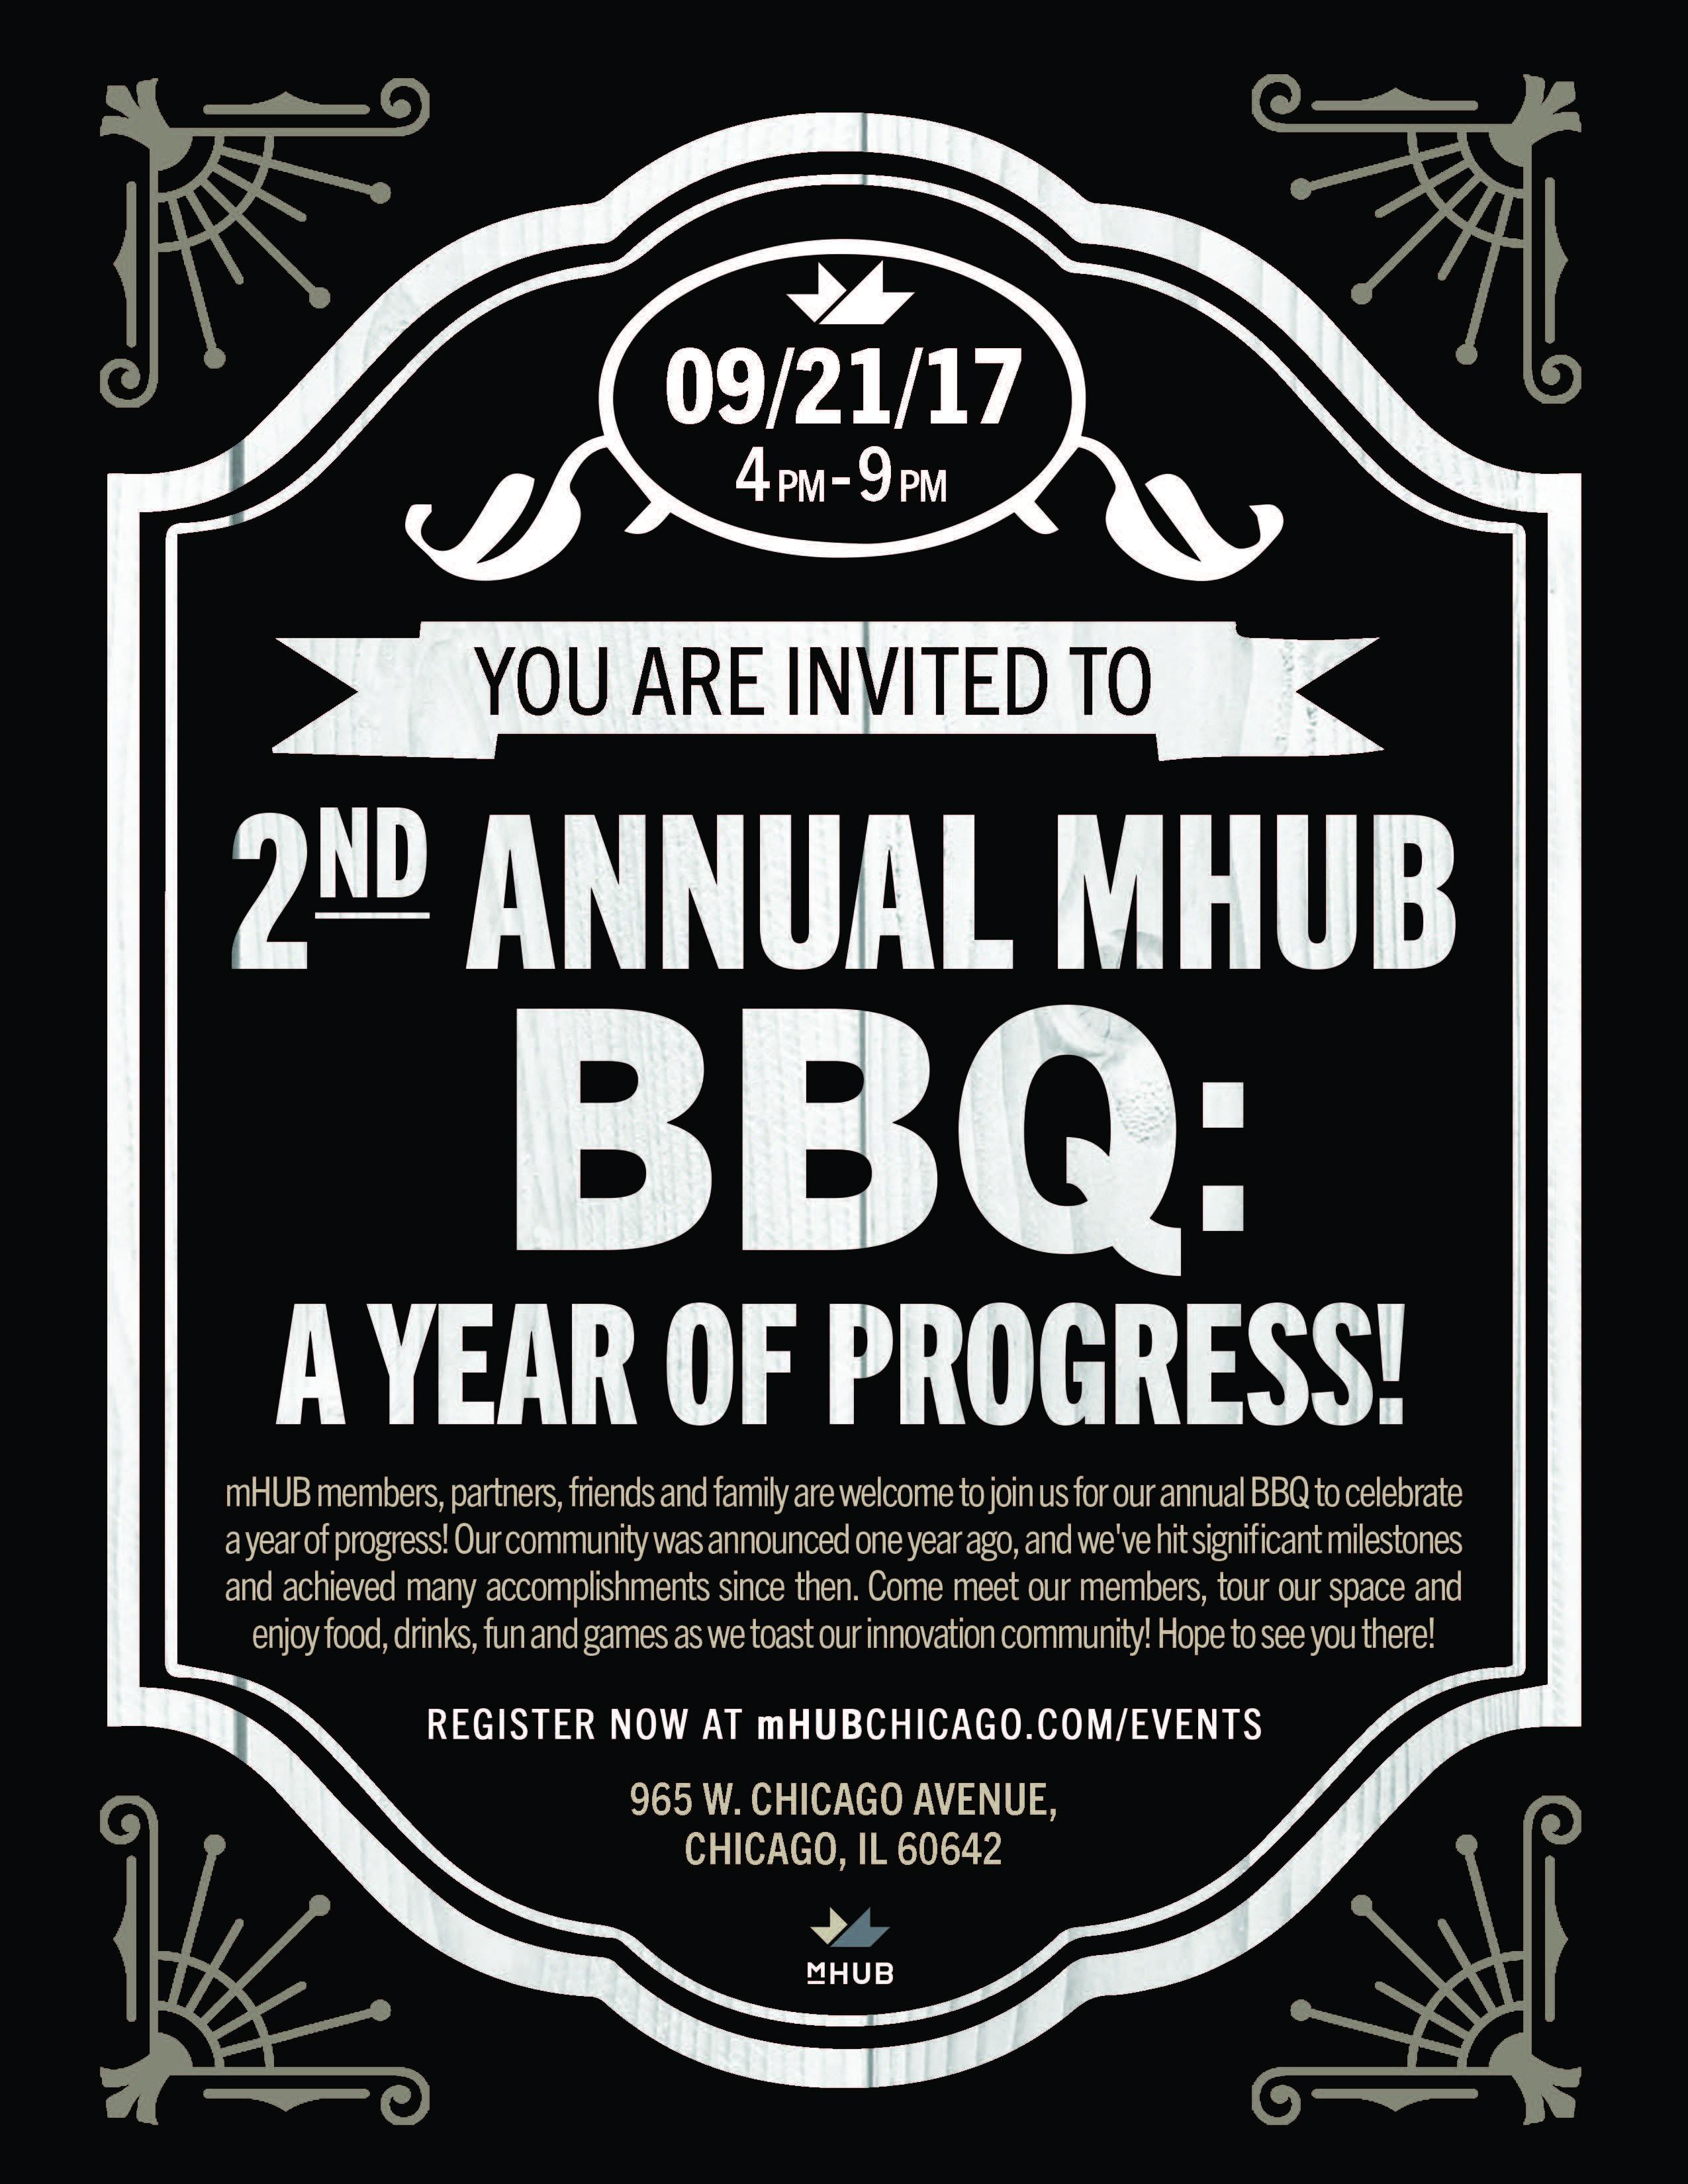 2nd Annual mHUB BBQ: A Year of Progress!